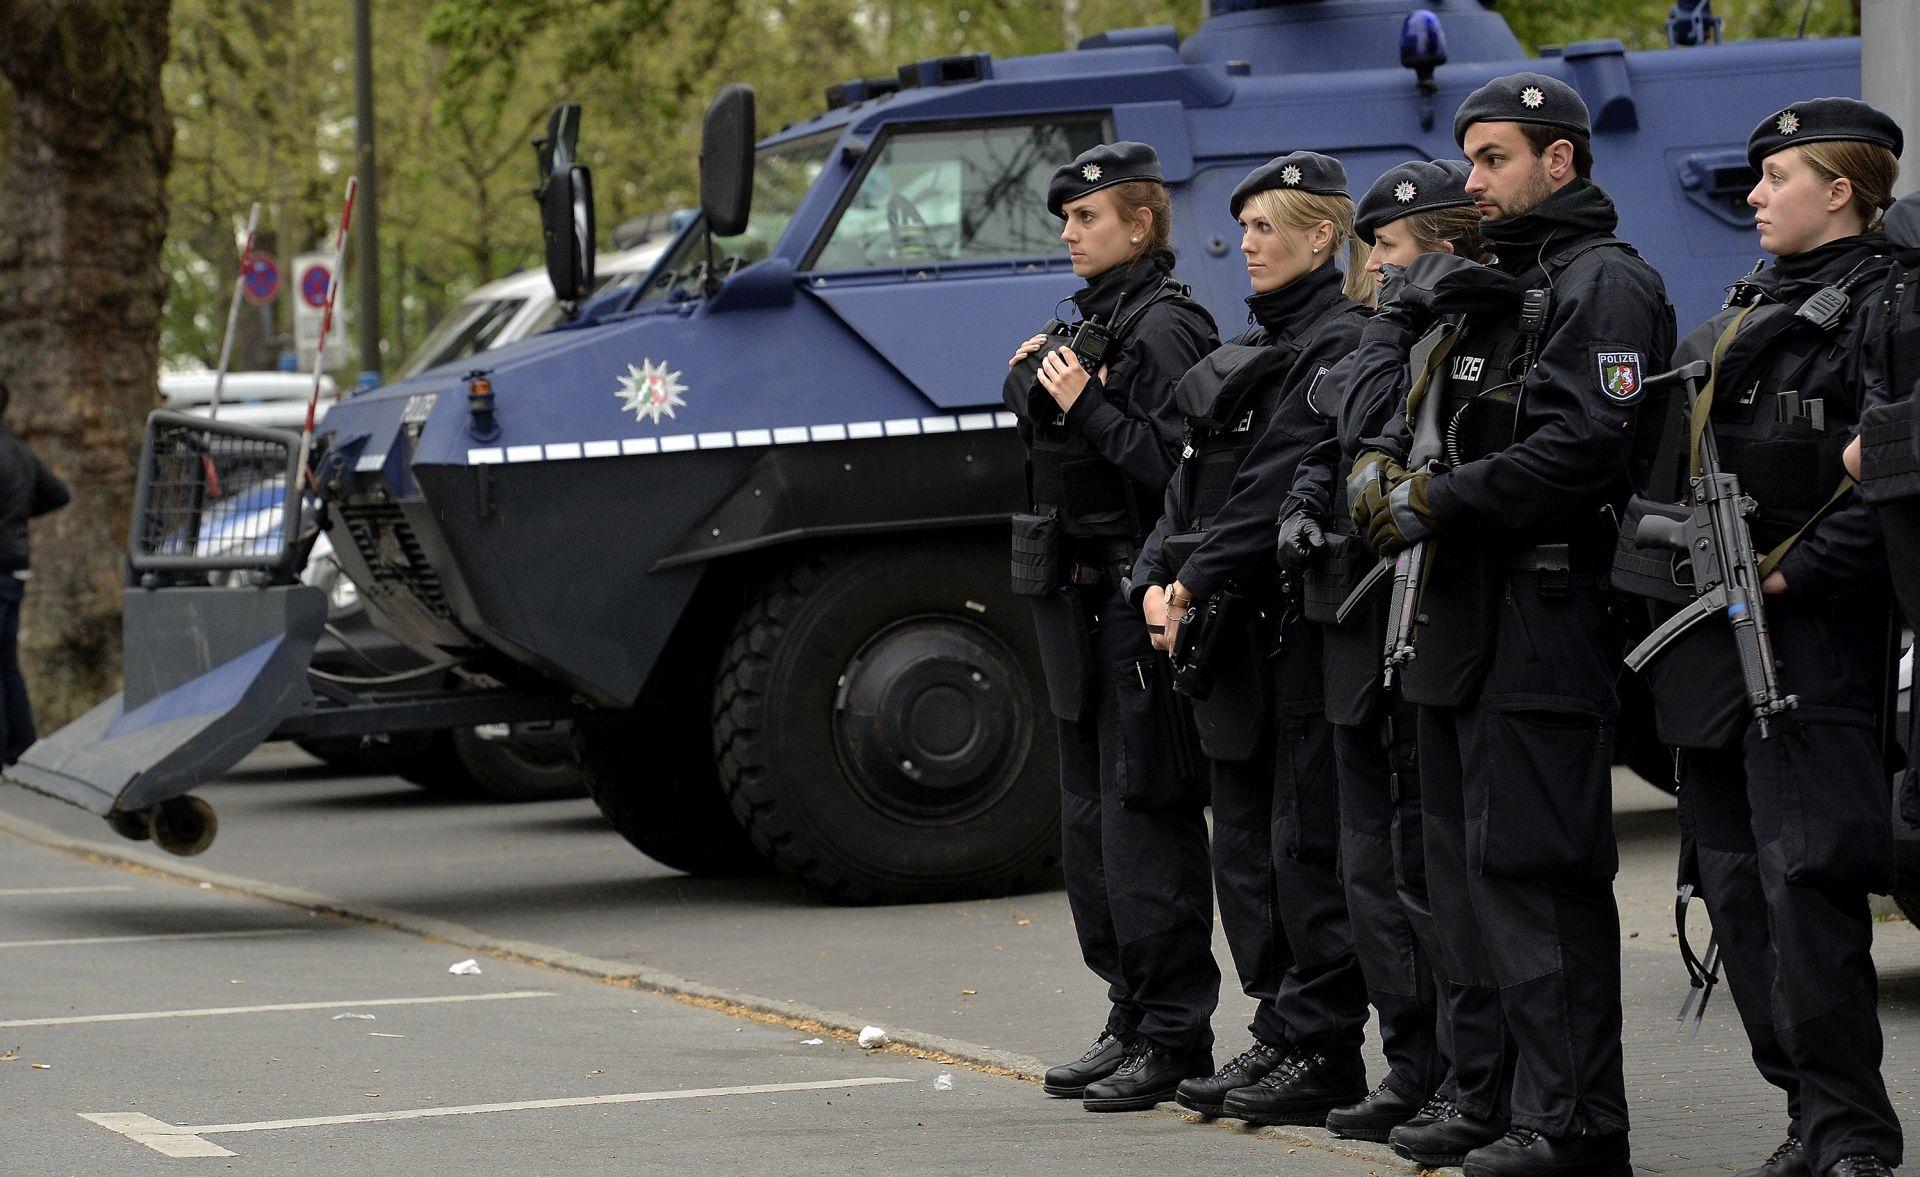 Njemačka policija uhitila trojac osumnjičen za pomaganje islamskog militantu